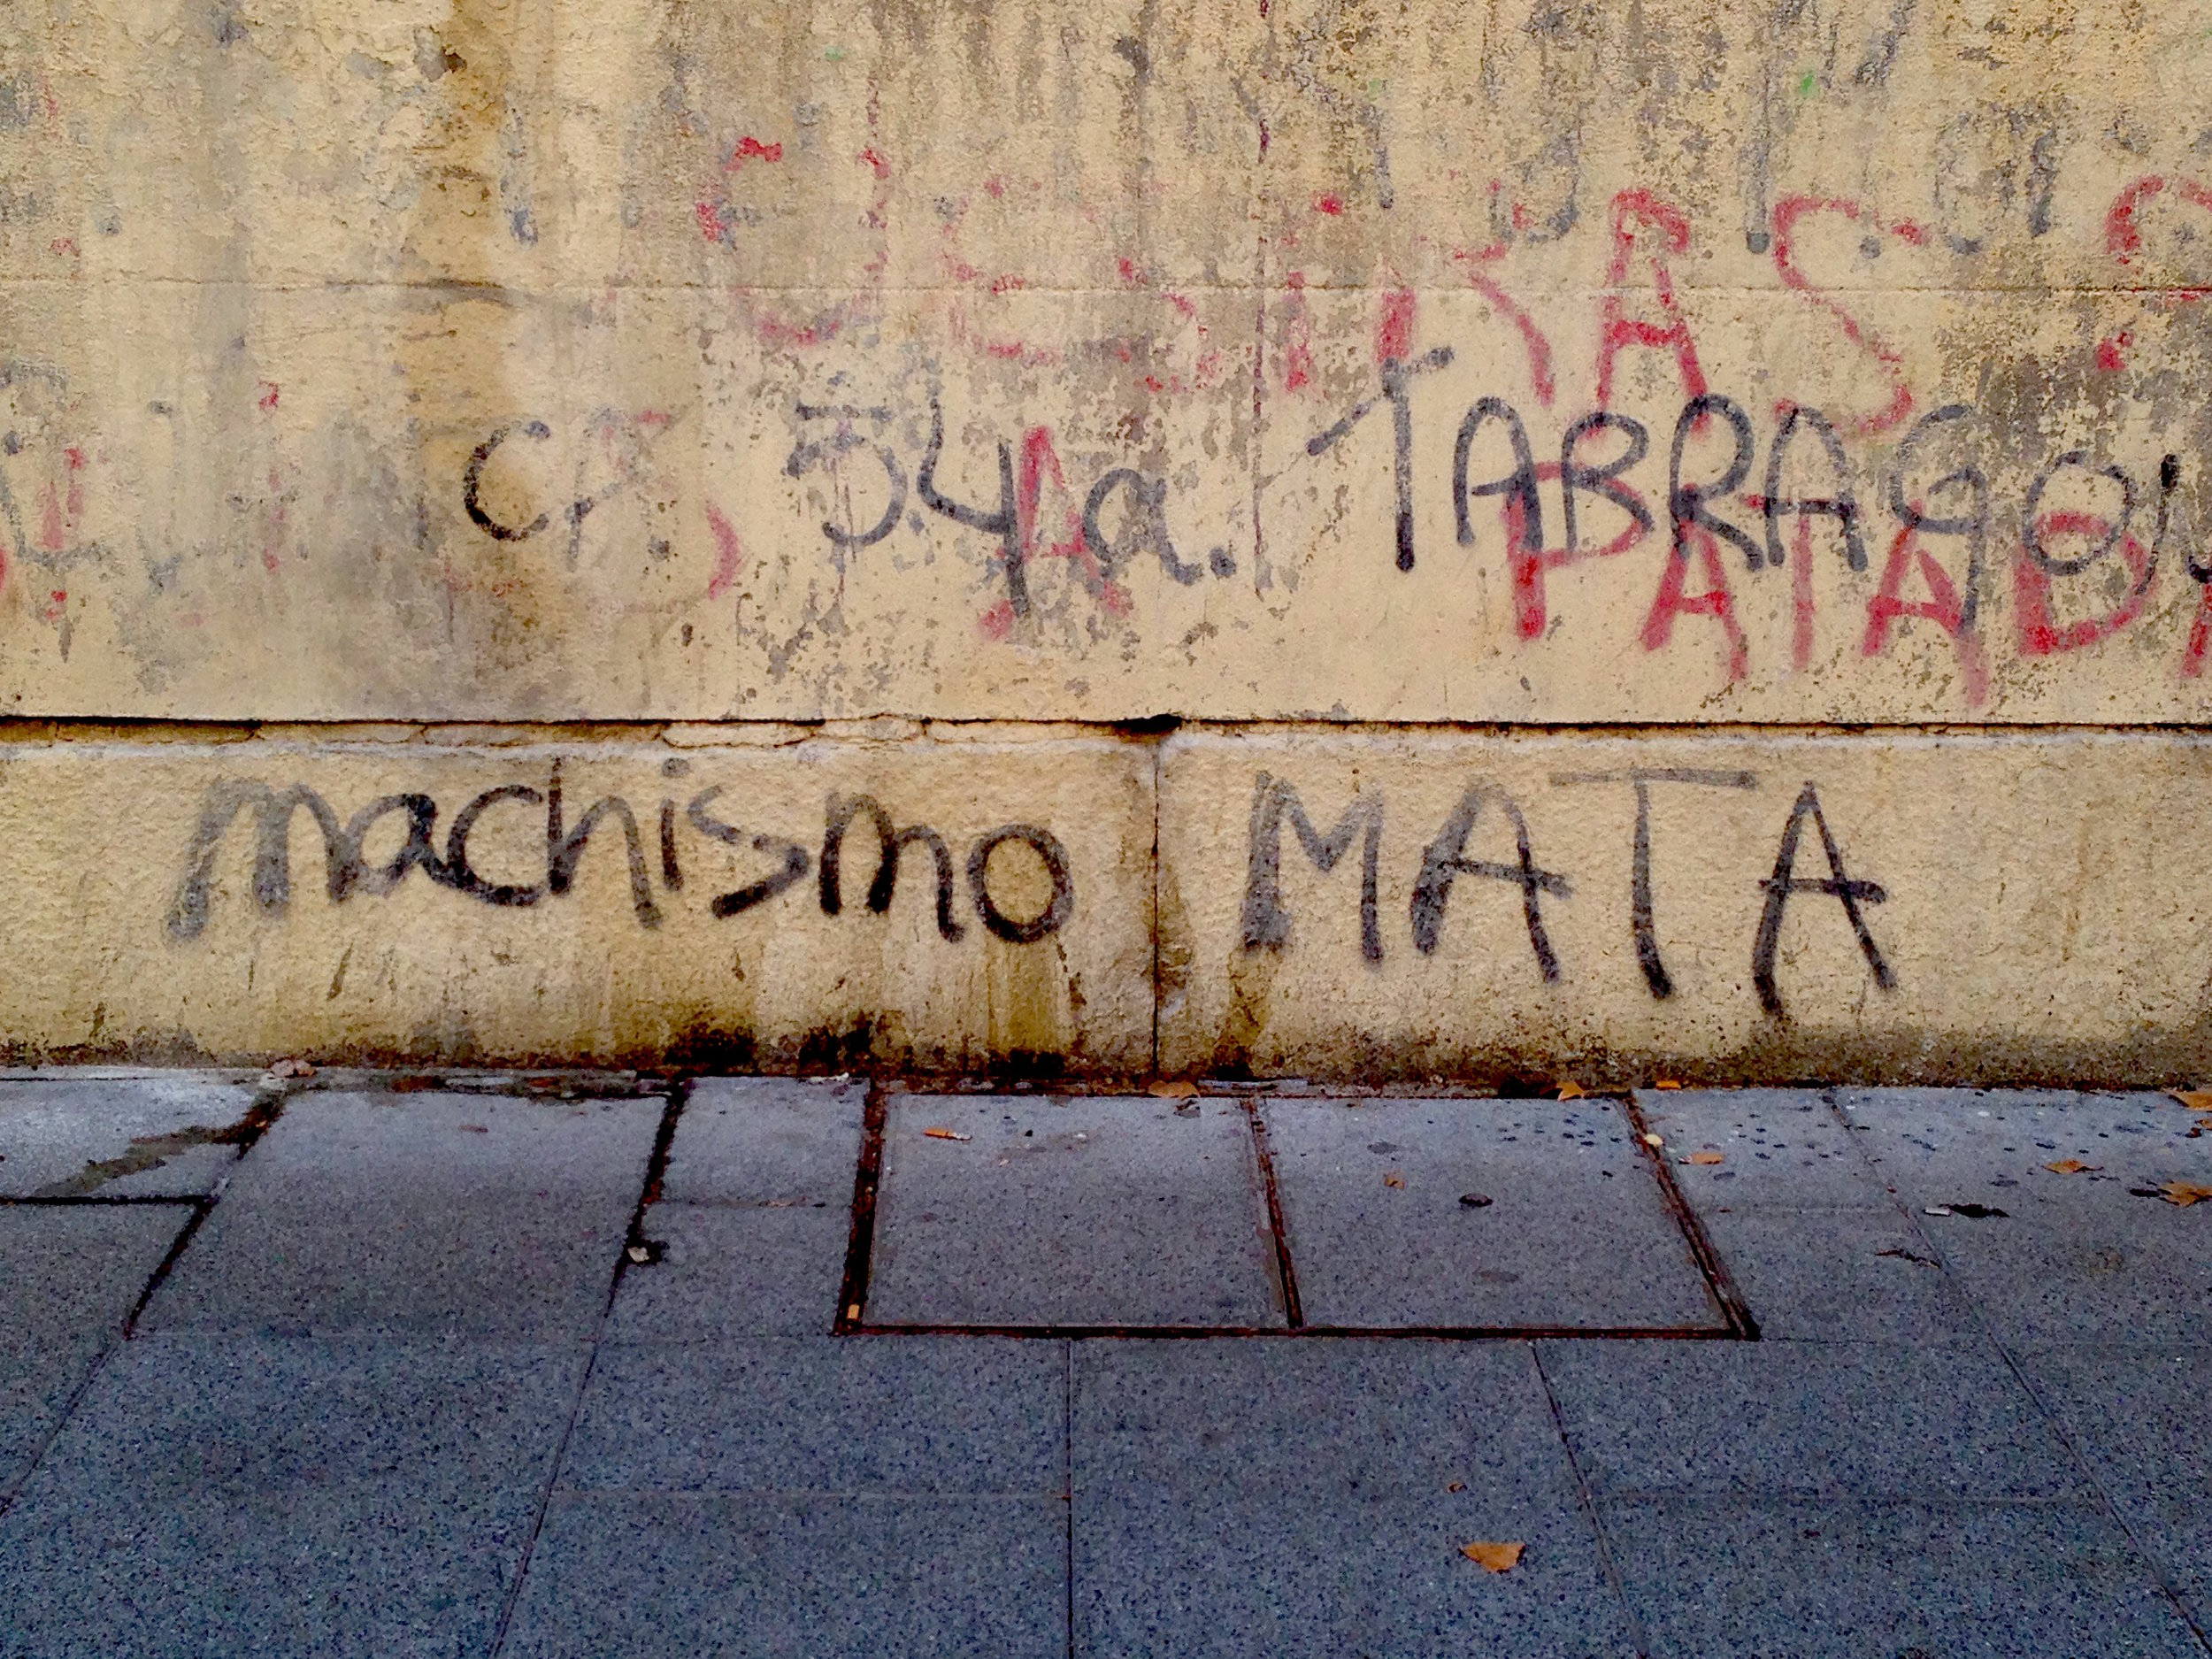 Machismo —sexism or chauvanism— kills.